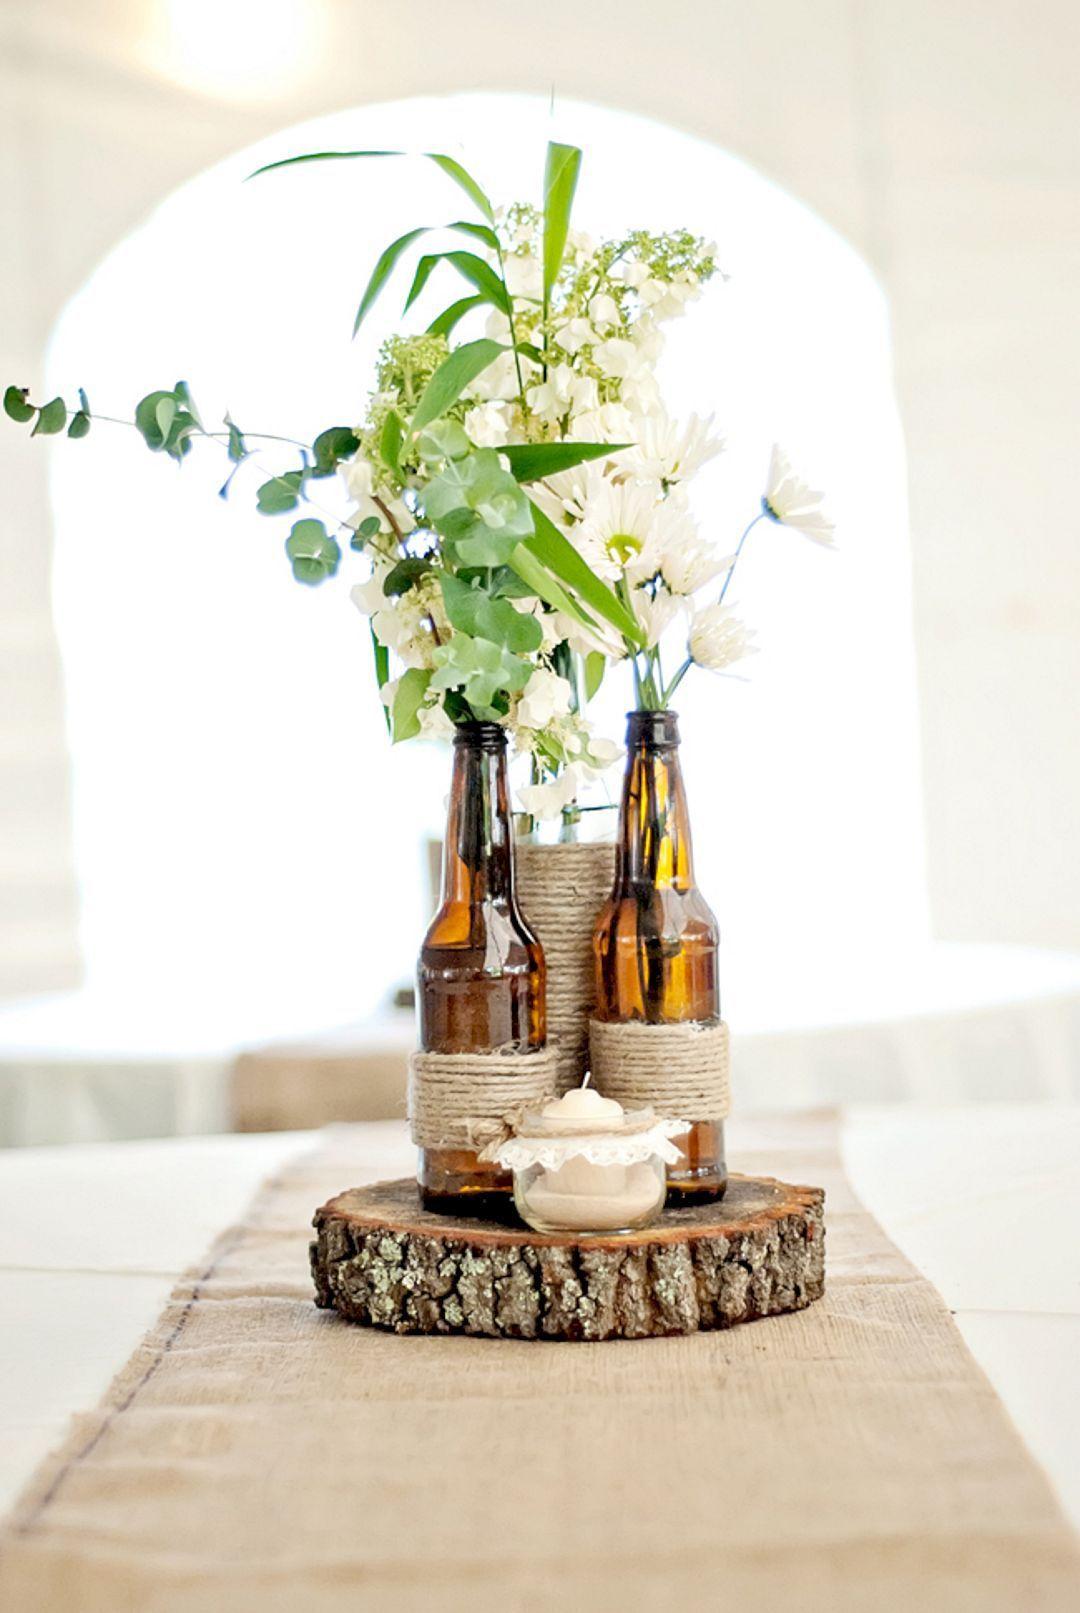 Marvelous Rustic Chic Backyard Wedding Party Decor Ideas no 11 ...